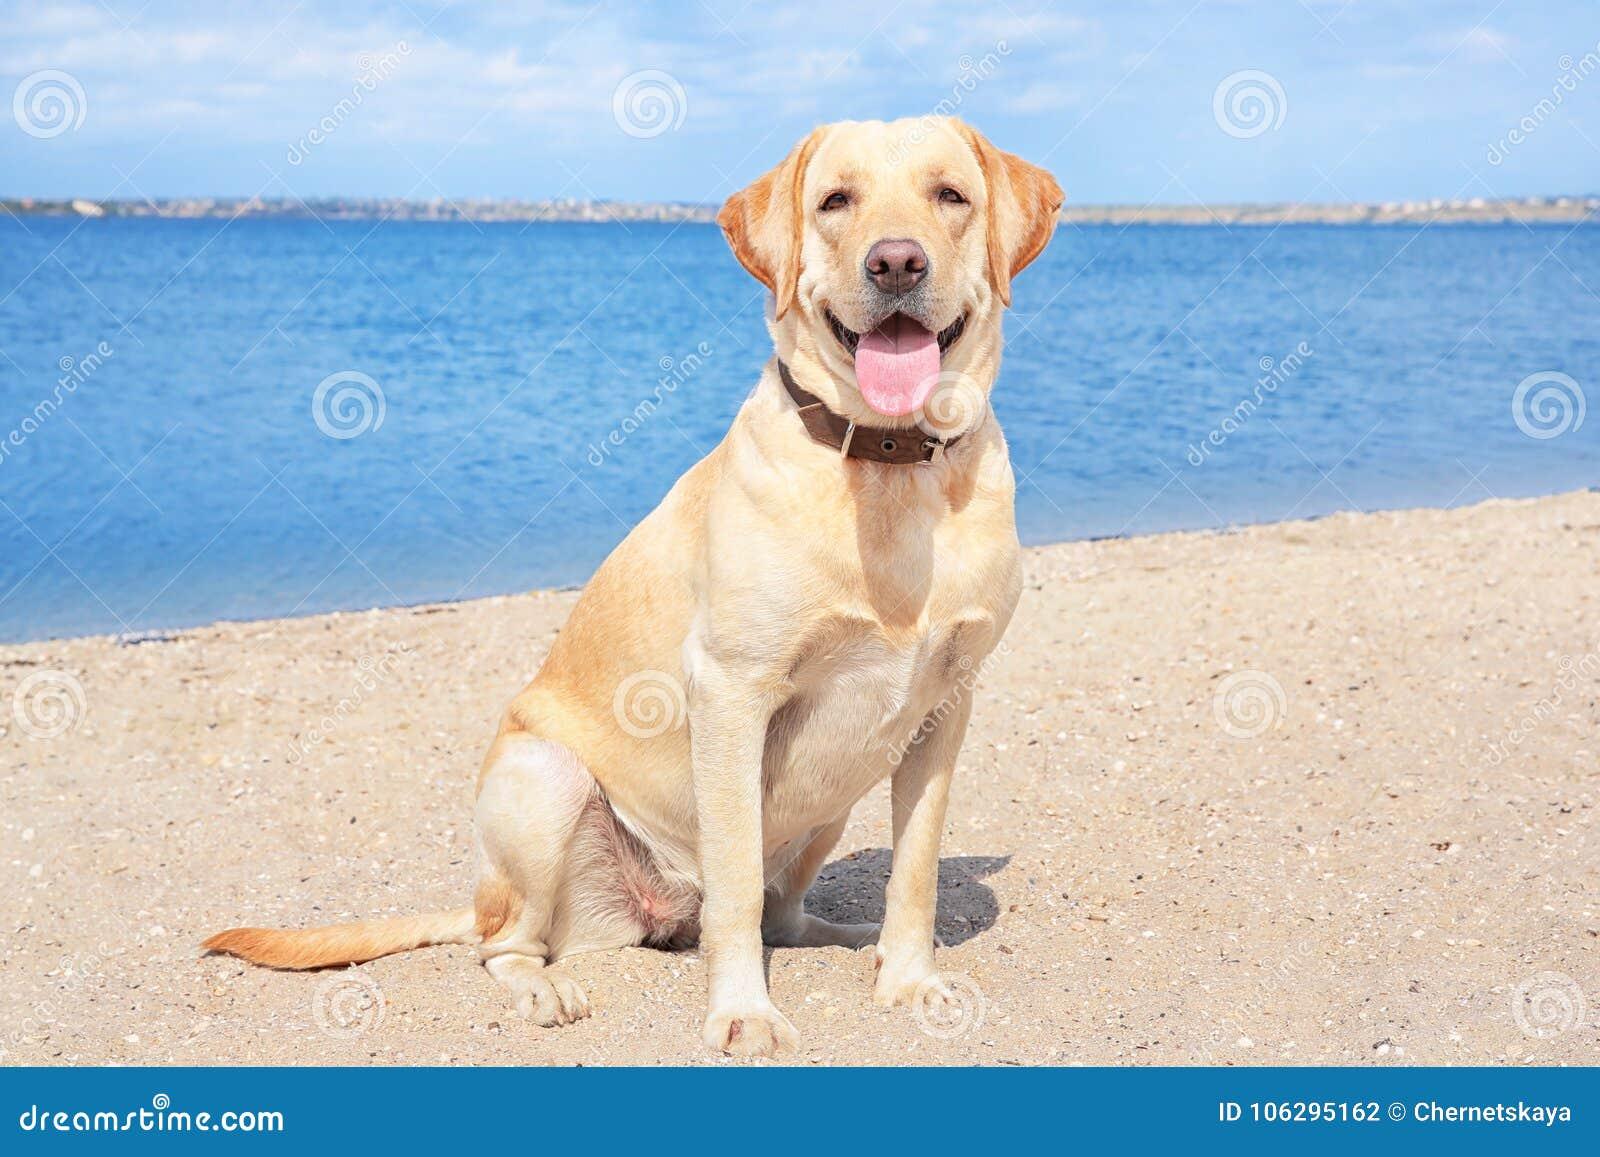 Cute Labrador Retriever on sandy river